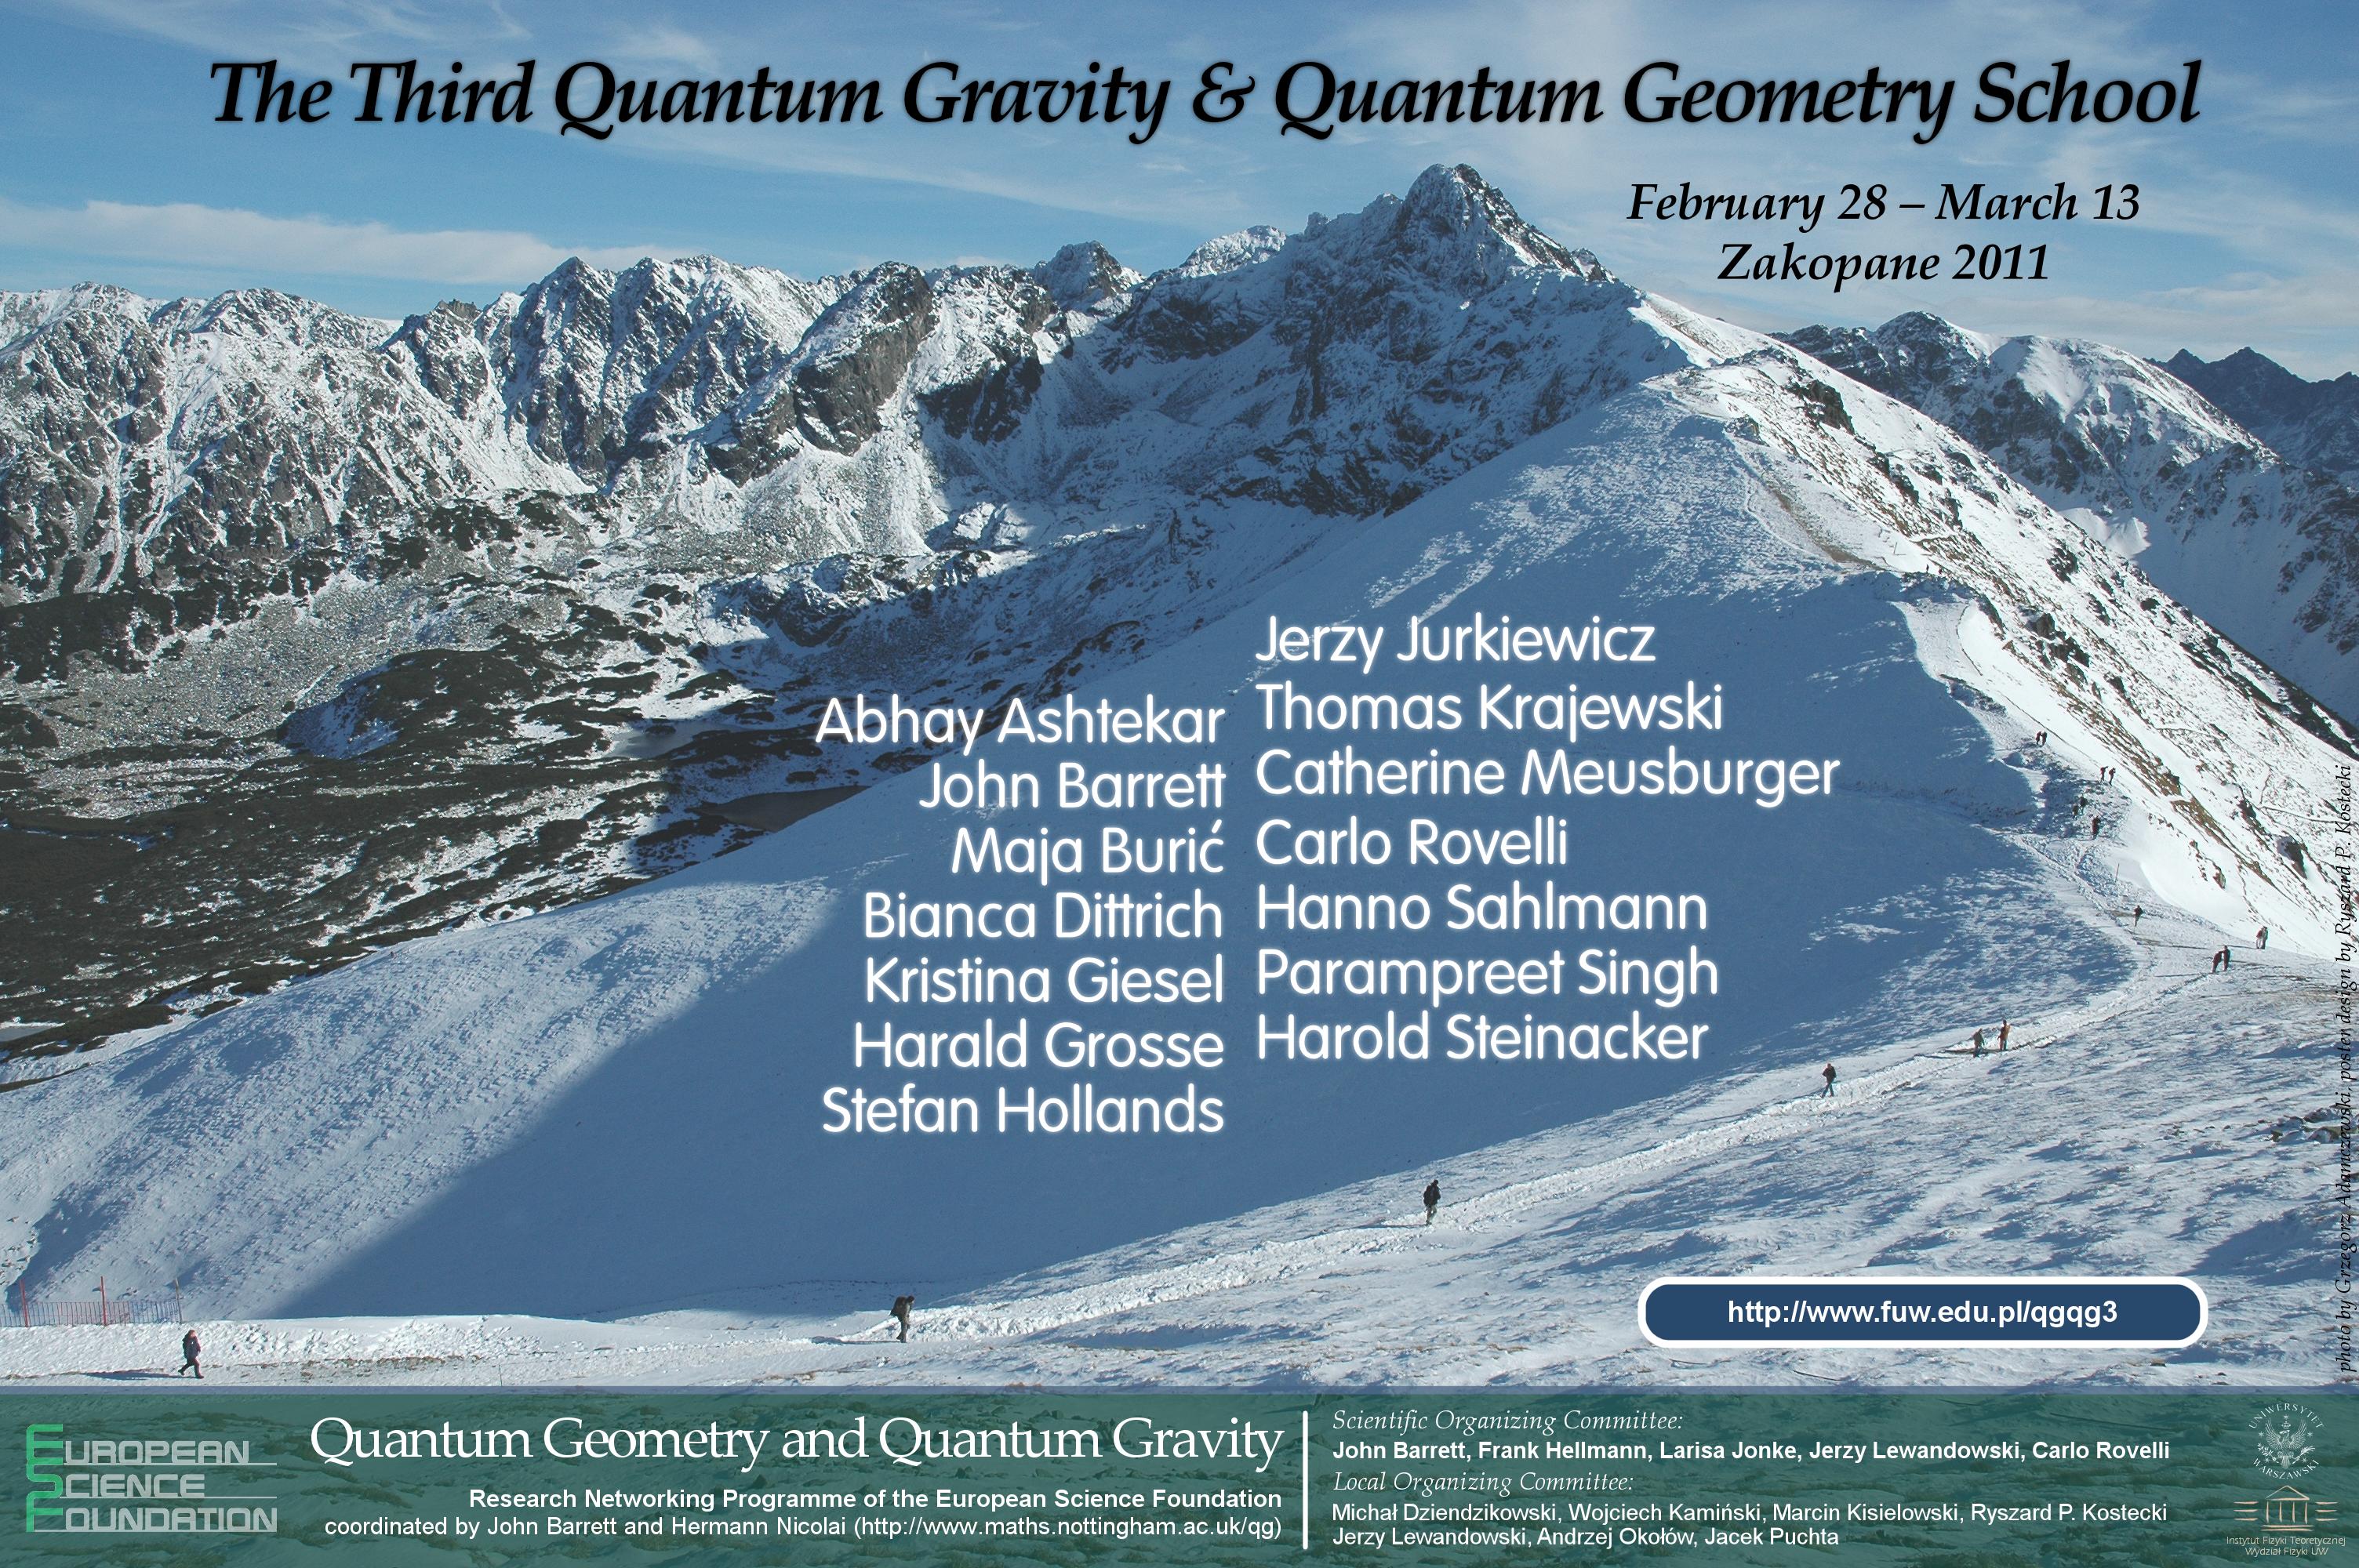 The 3rd Quantum Geometry and Quantum Gravity School